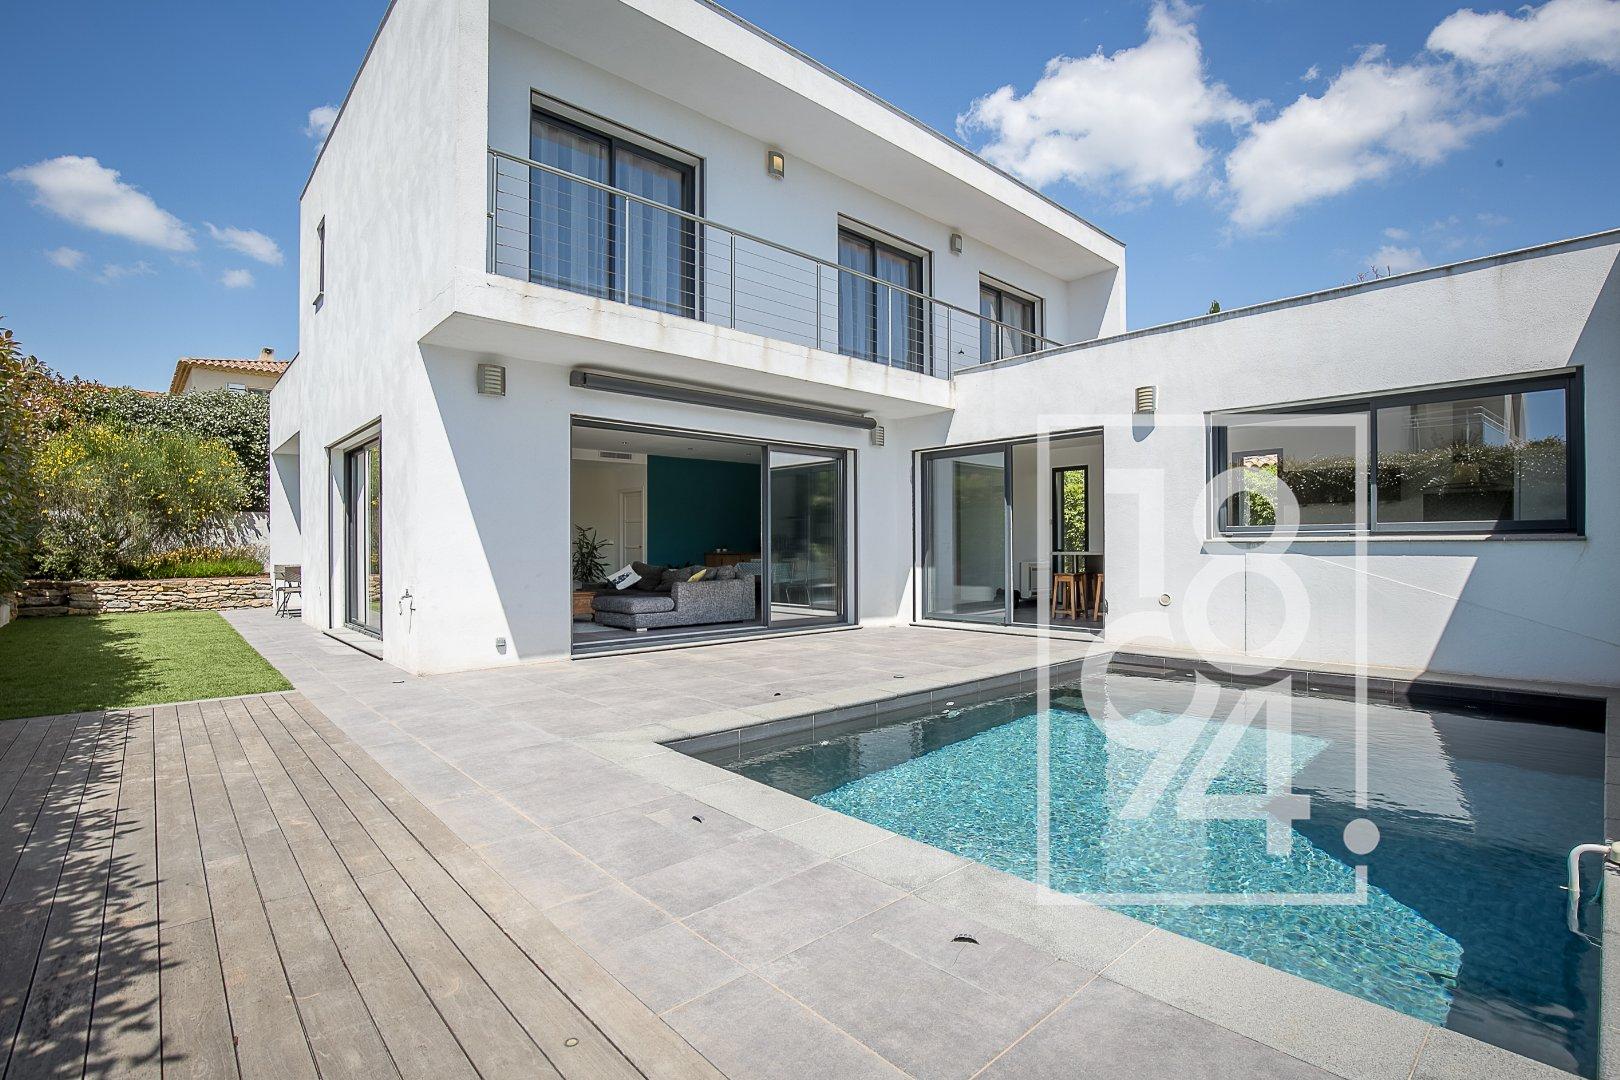 Superbe villa d'architecte californienne avec piscine